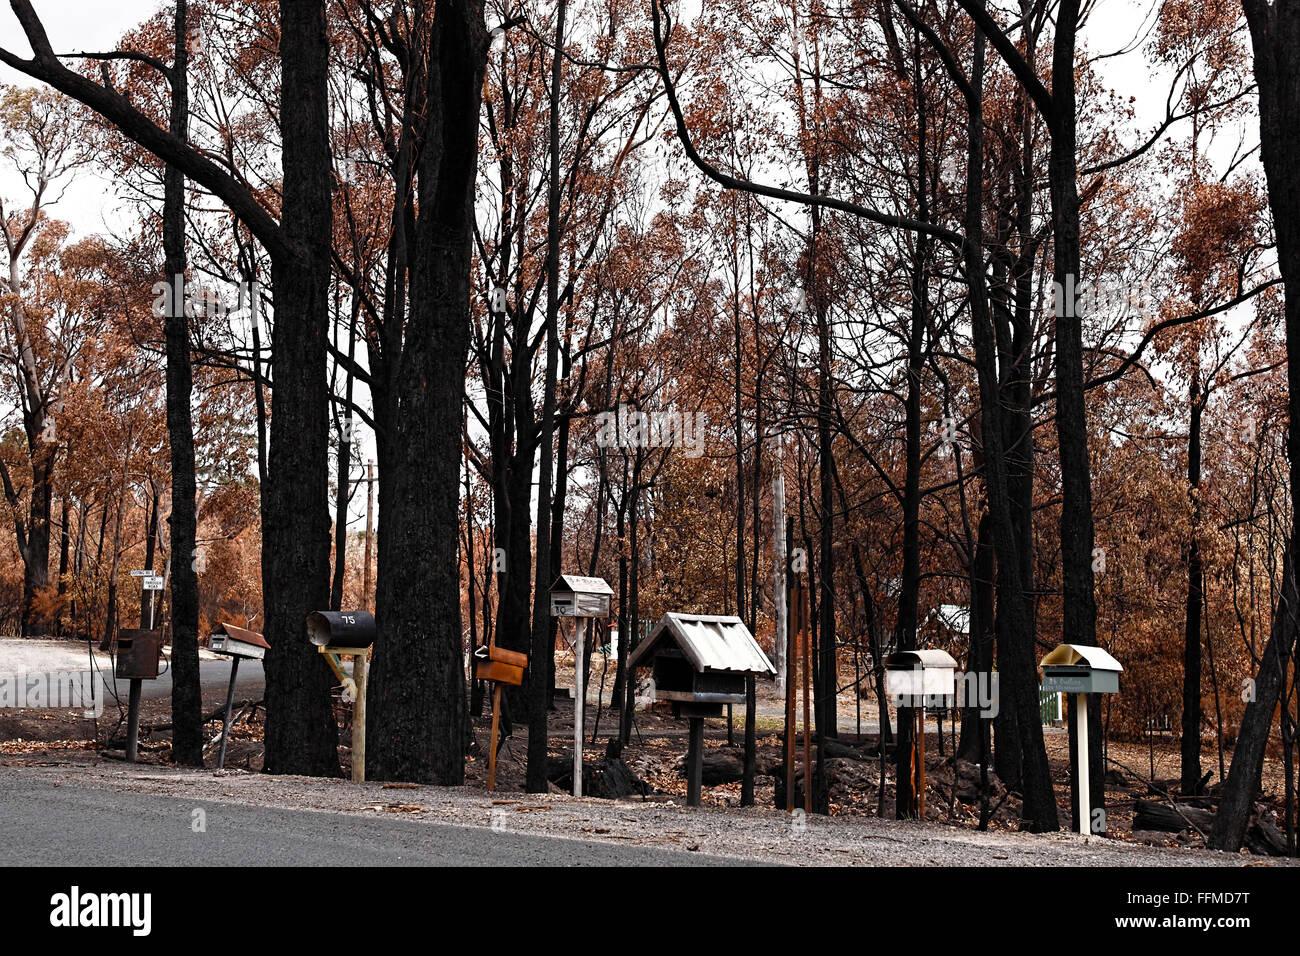 australian bush fire damage,australian bush fire aftermath,post australian bush fire, - Stock Image